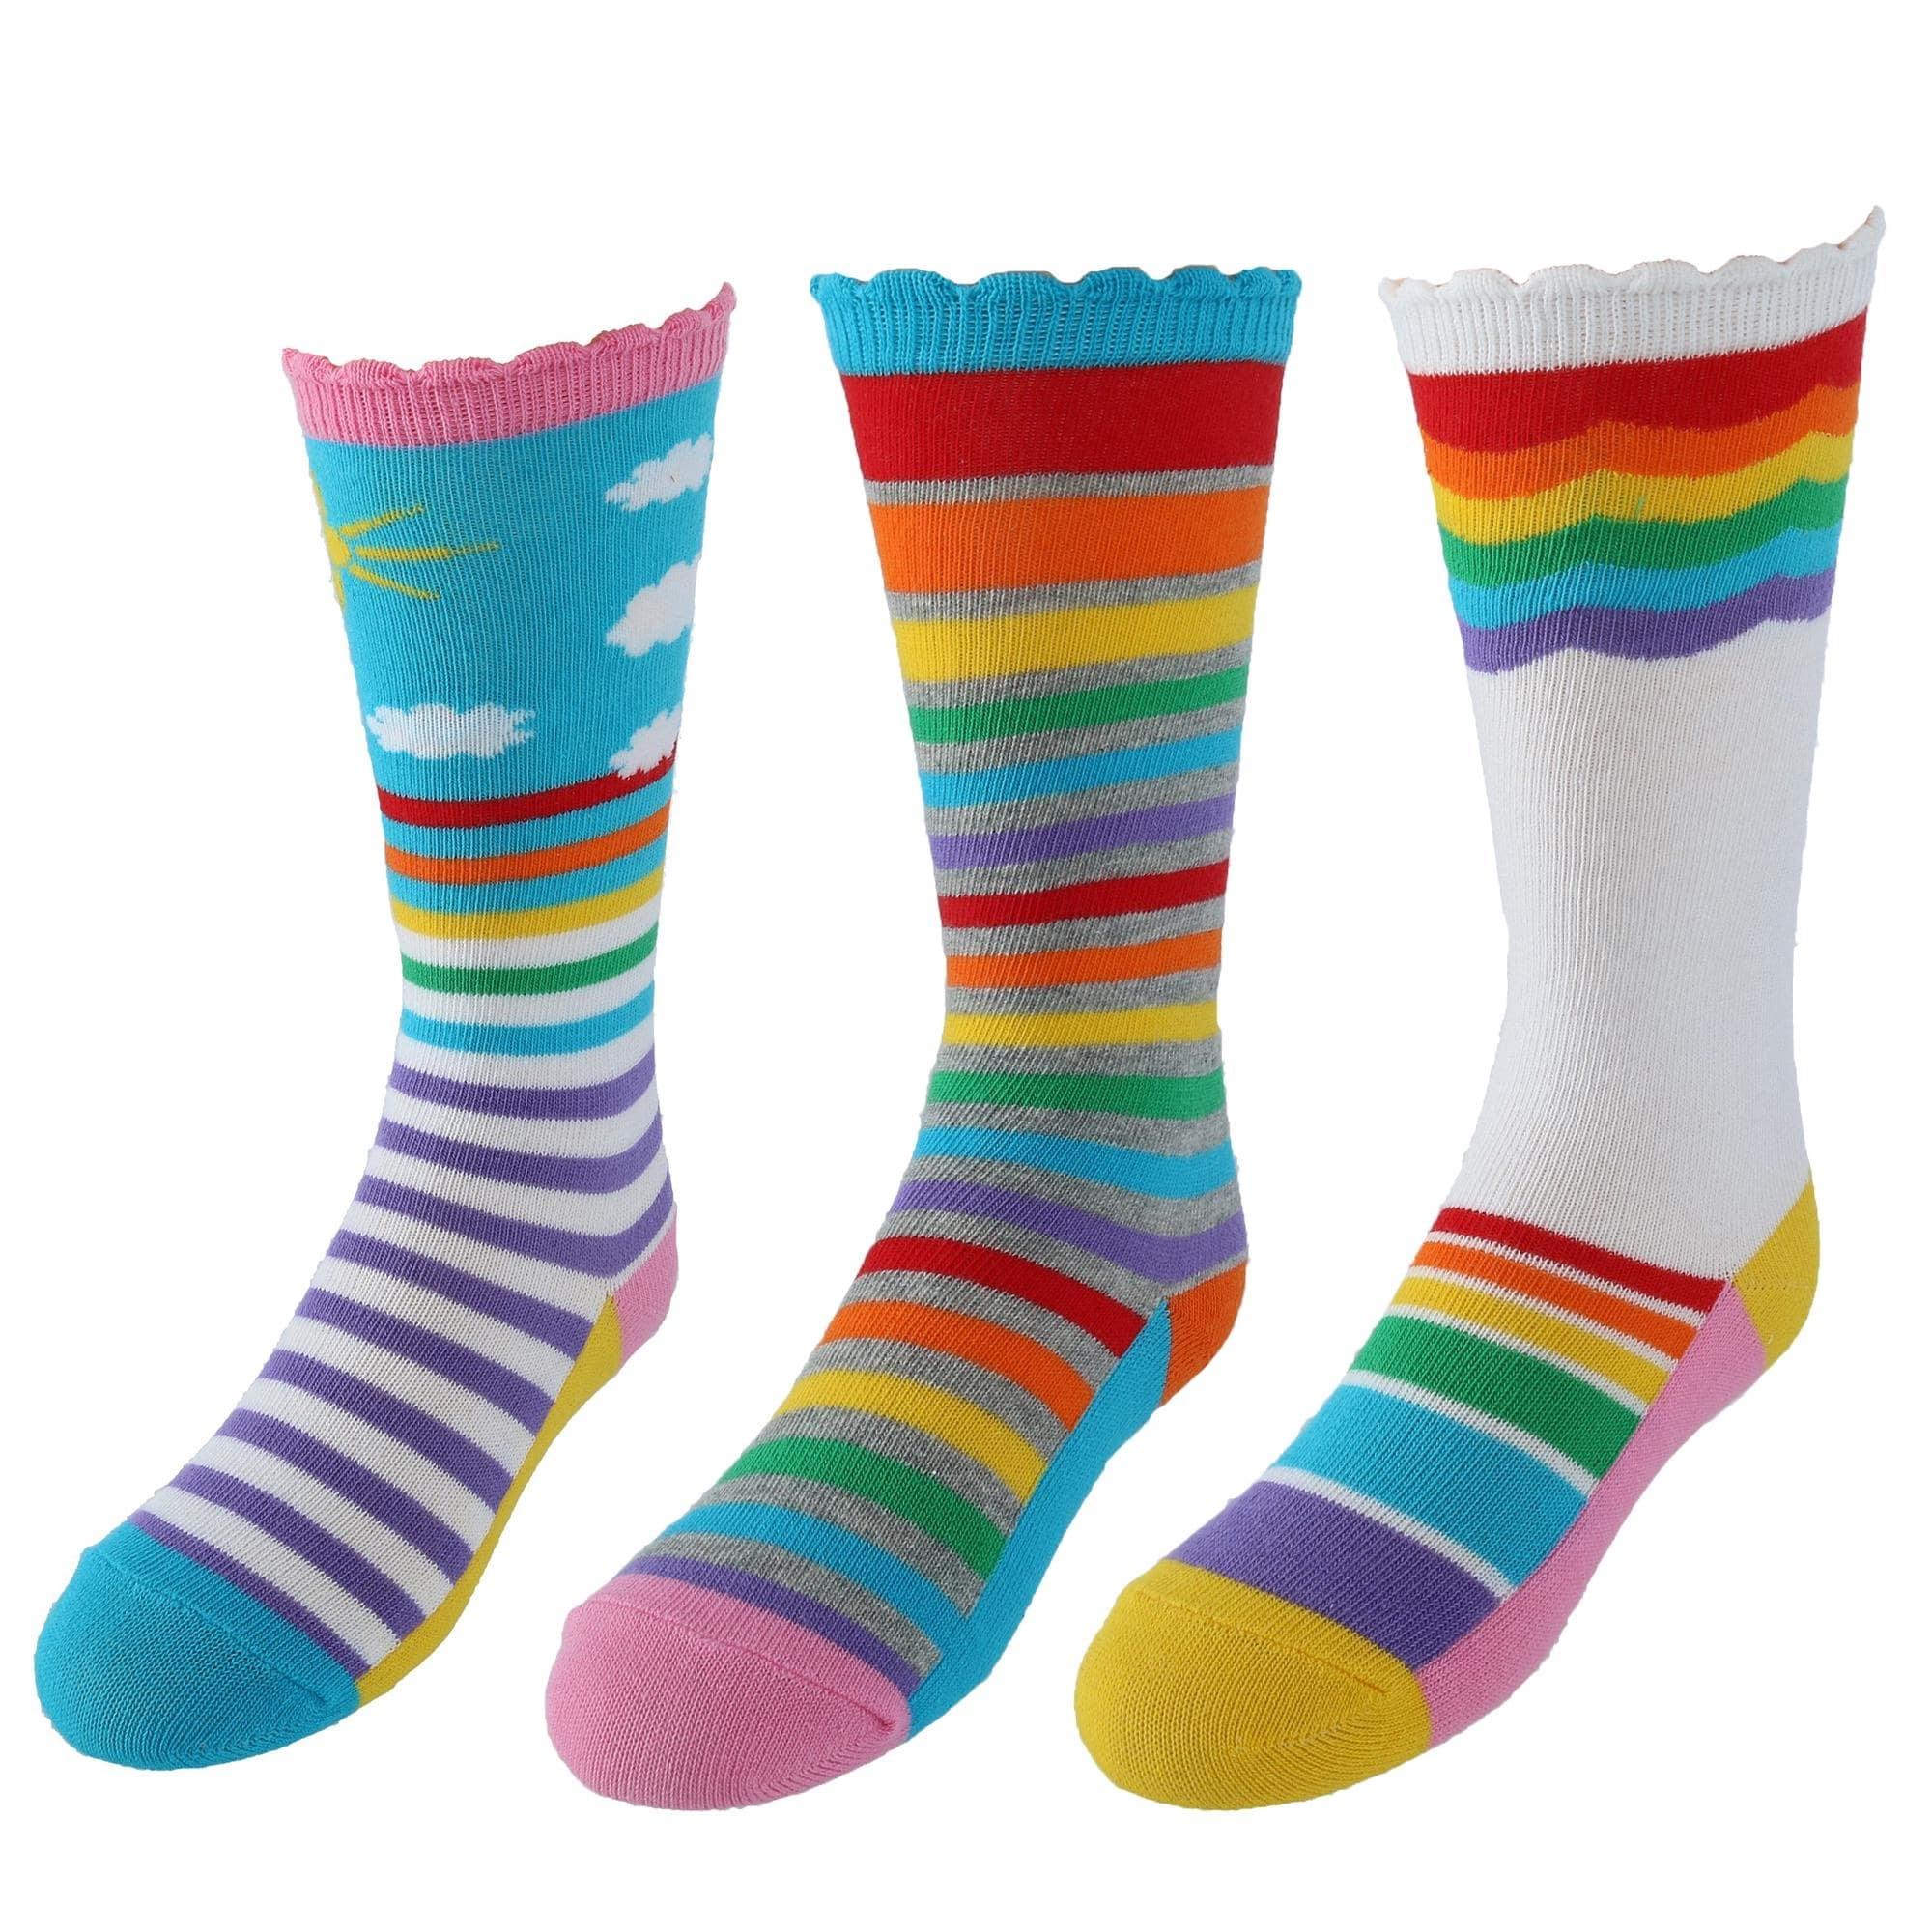 Jefferies Socks Three Pairs of Organic Cotton Socks